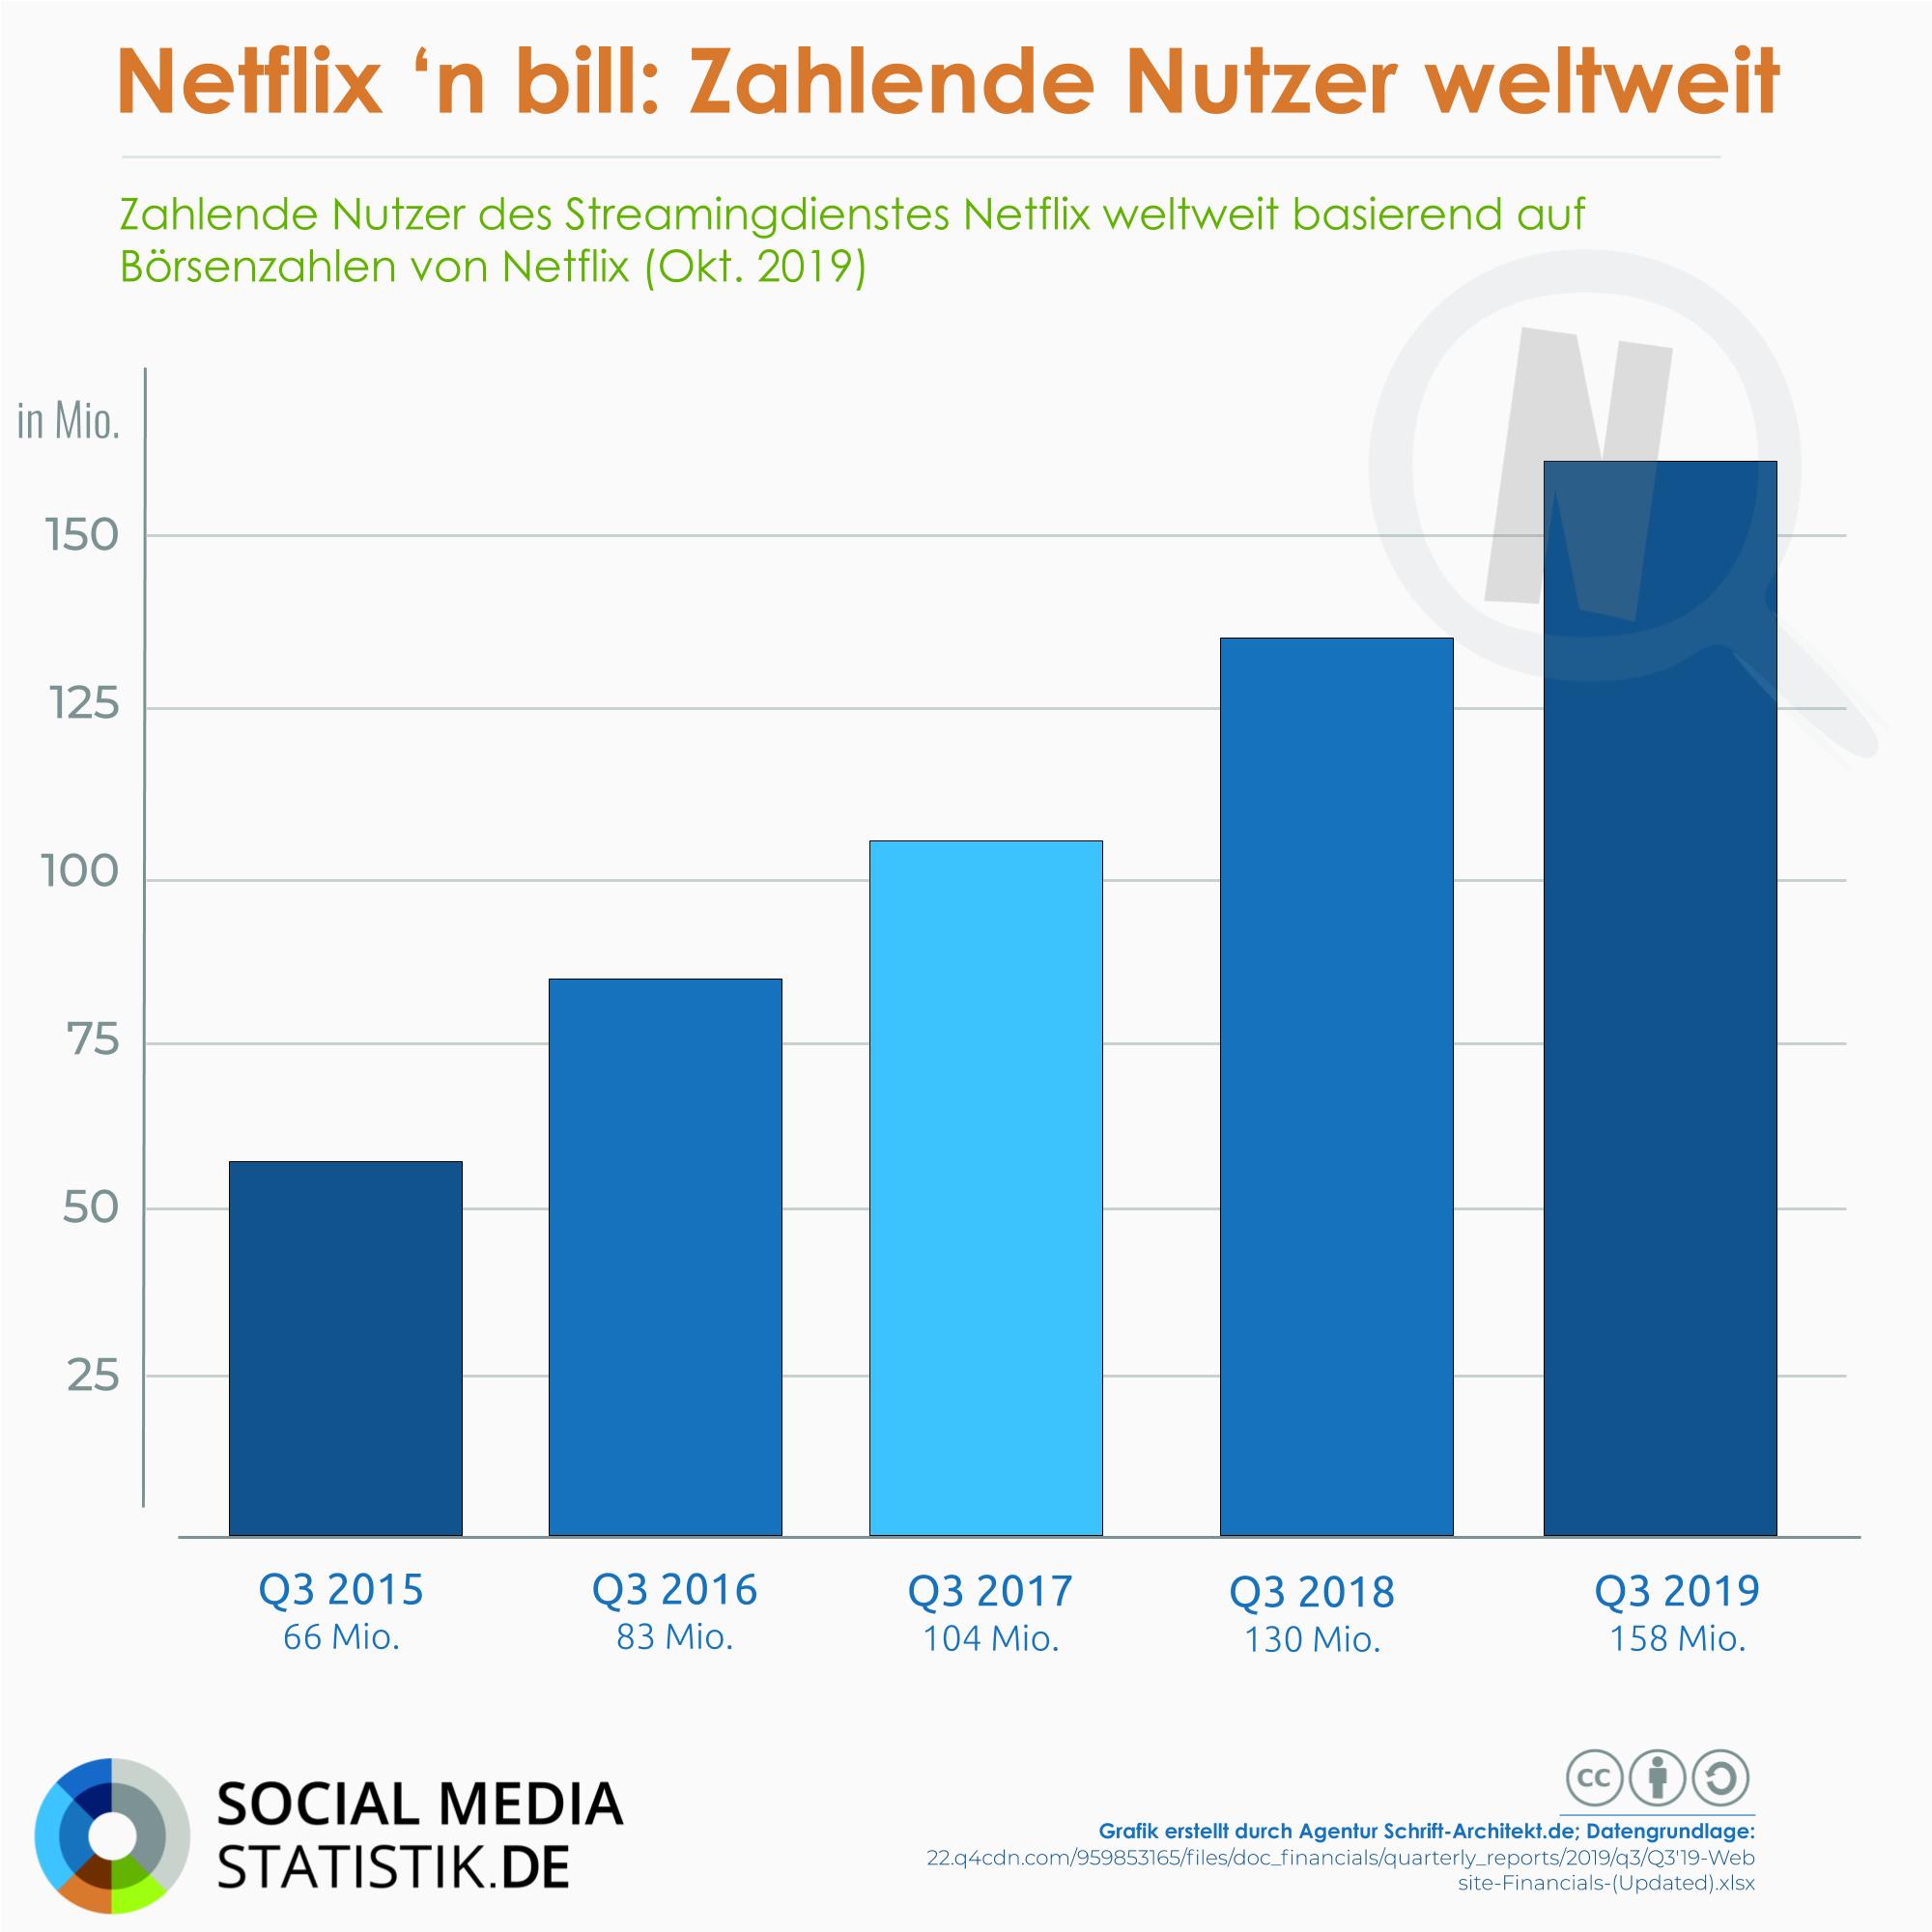 Infografik SocialMediaStatistik.de zum Thema netflix nutzer weltweit